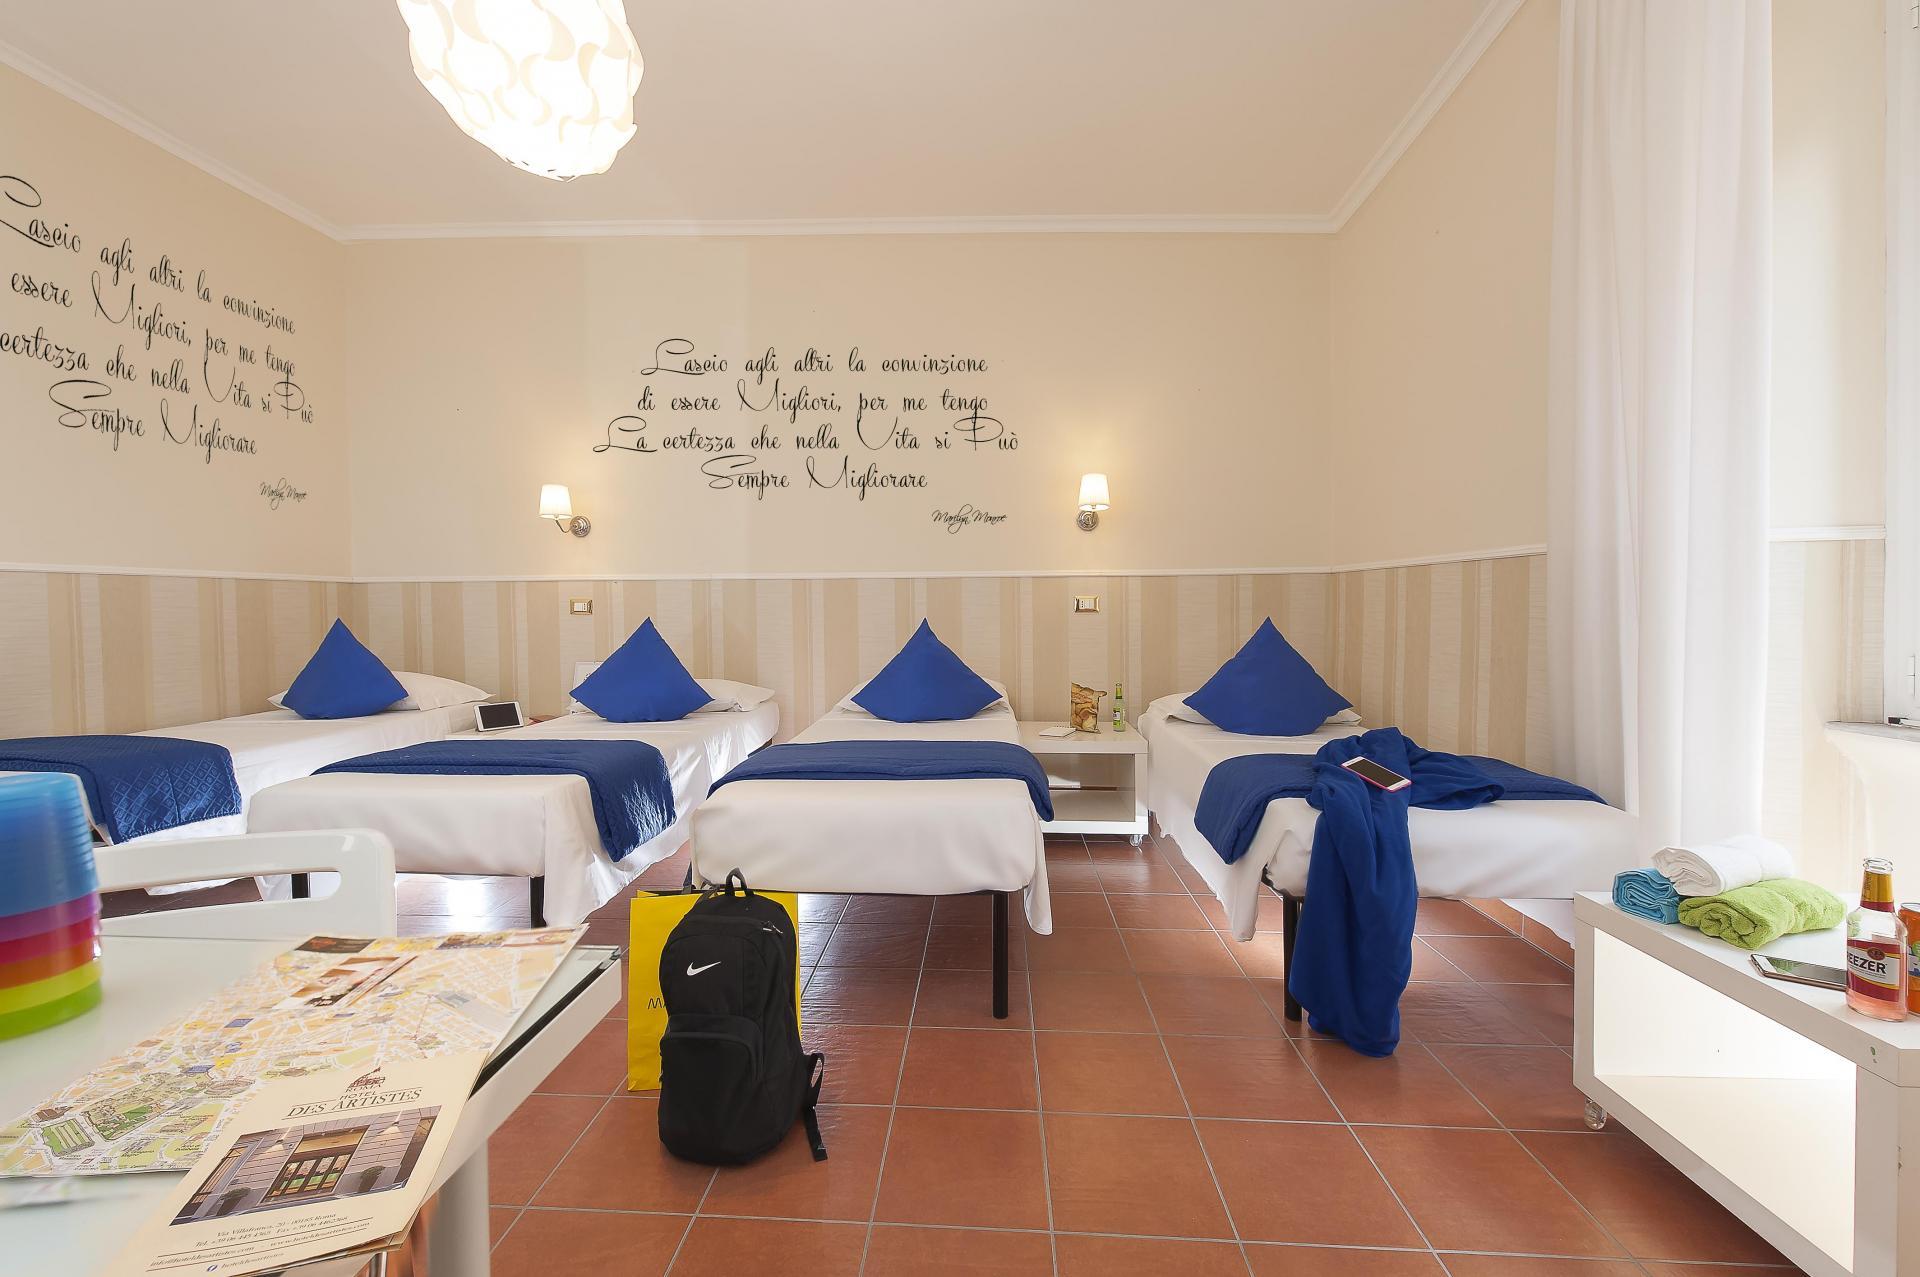 Hostel Des Artistes Budget Rooms